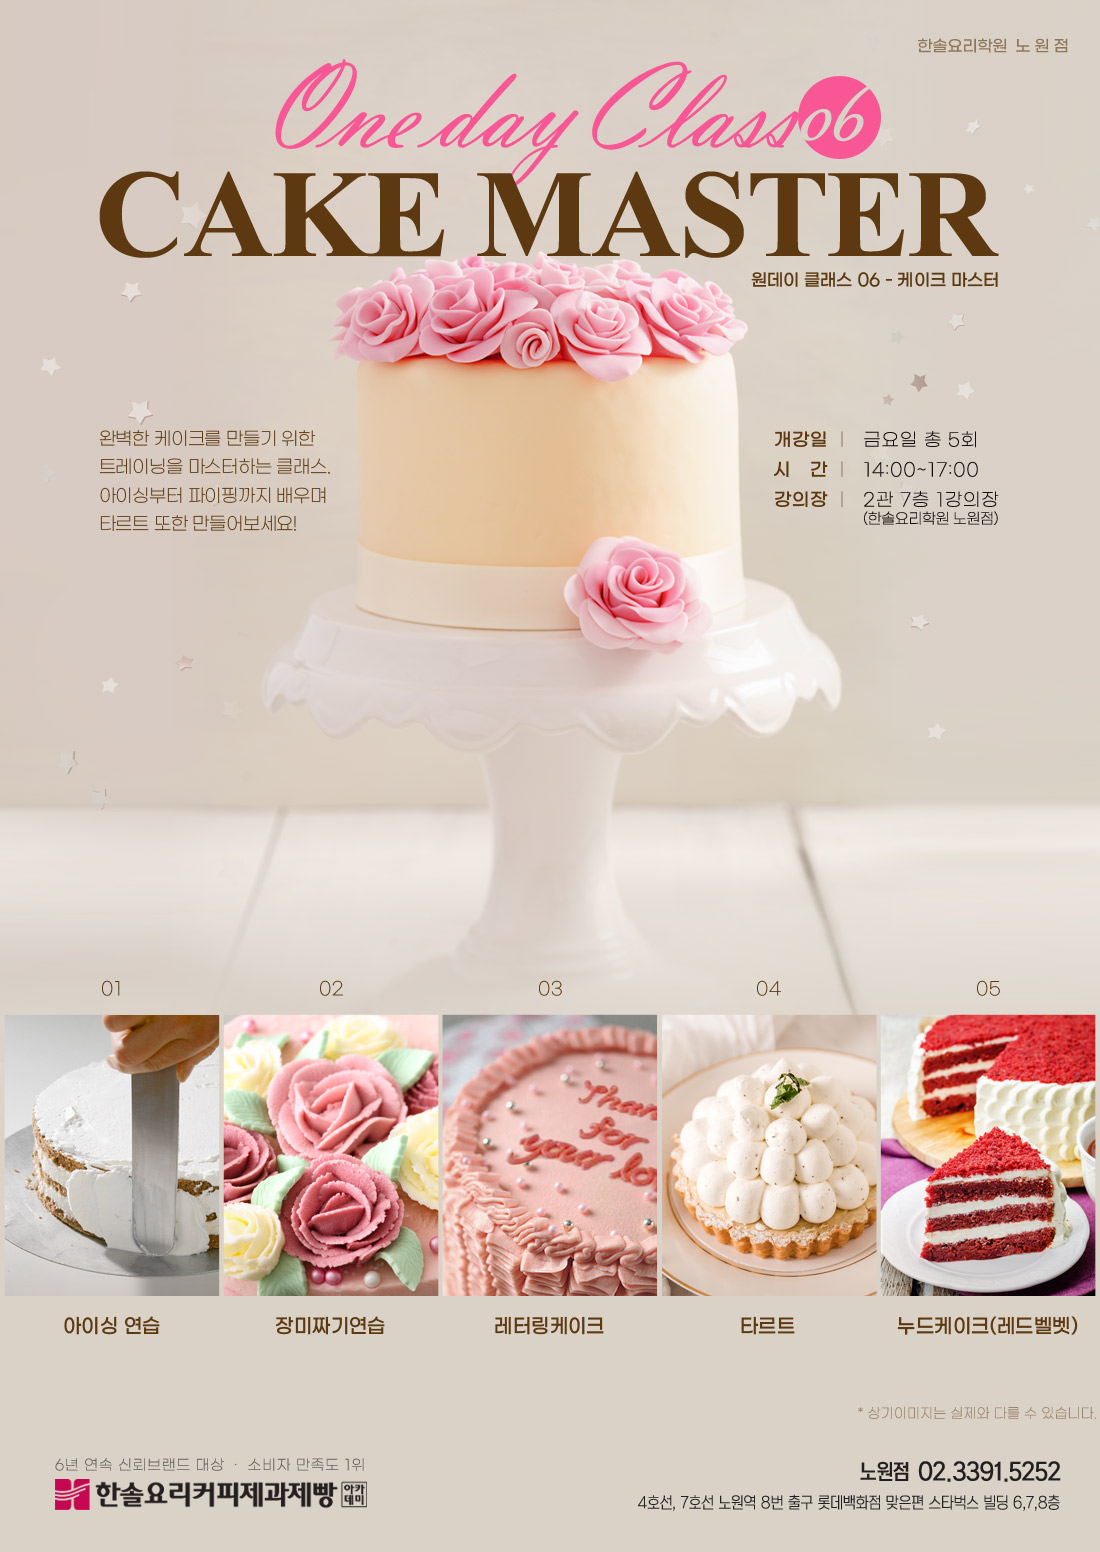 Cake master 케이크마스터 원데이클래스 노원점